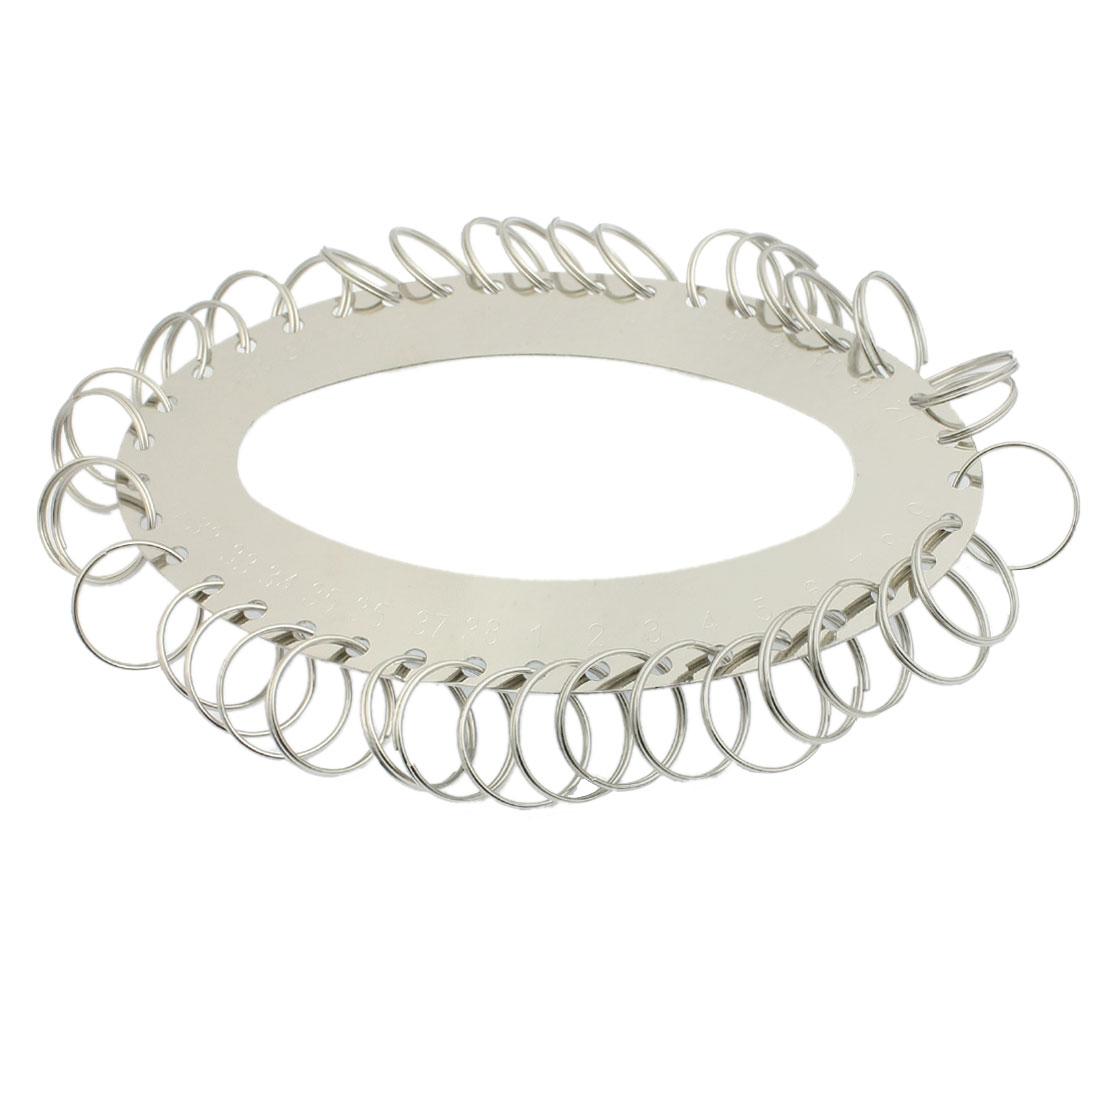 Warehouse Keys Classification Tool 38 Separable Rings Metal Holder Board